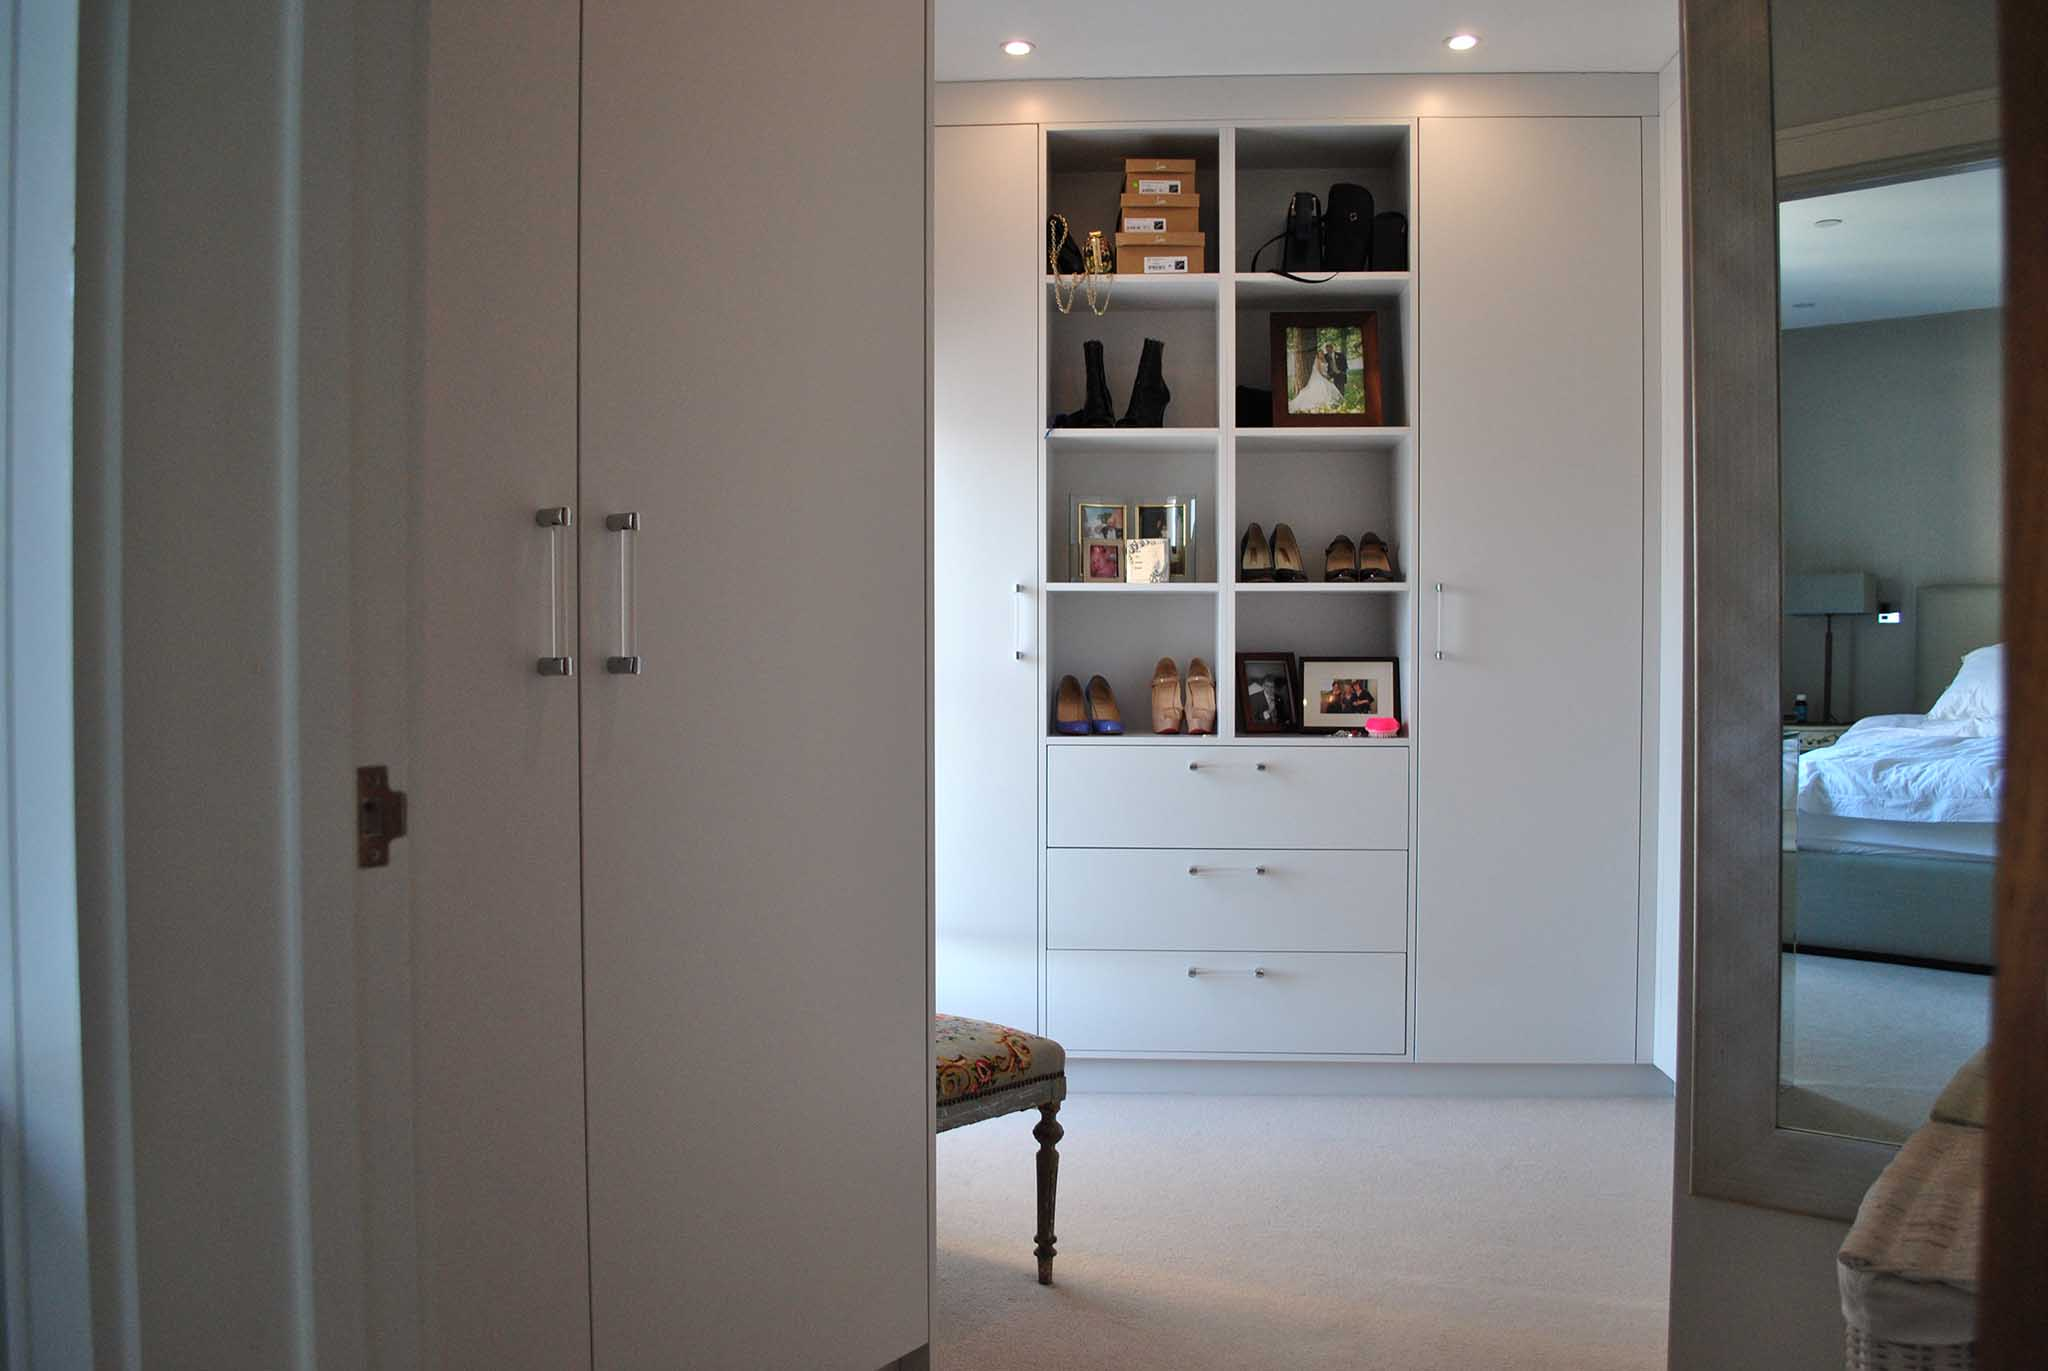 Clapham Shaker Kitchen: Kitchen Design London, Clapham, By Eclectic Interiors